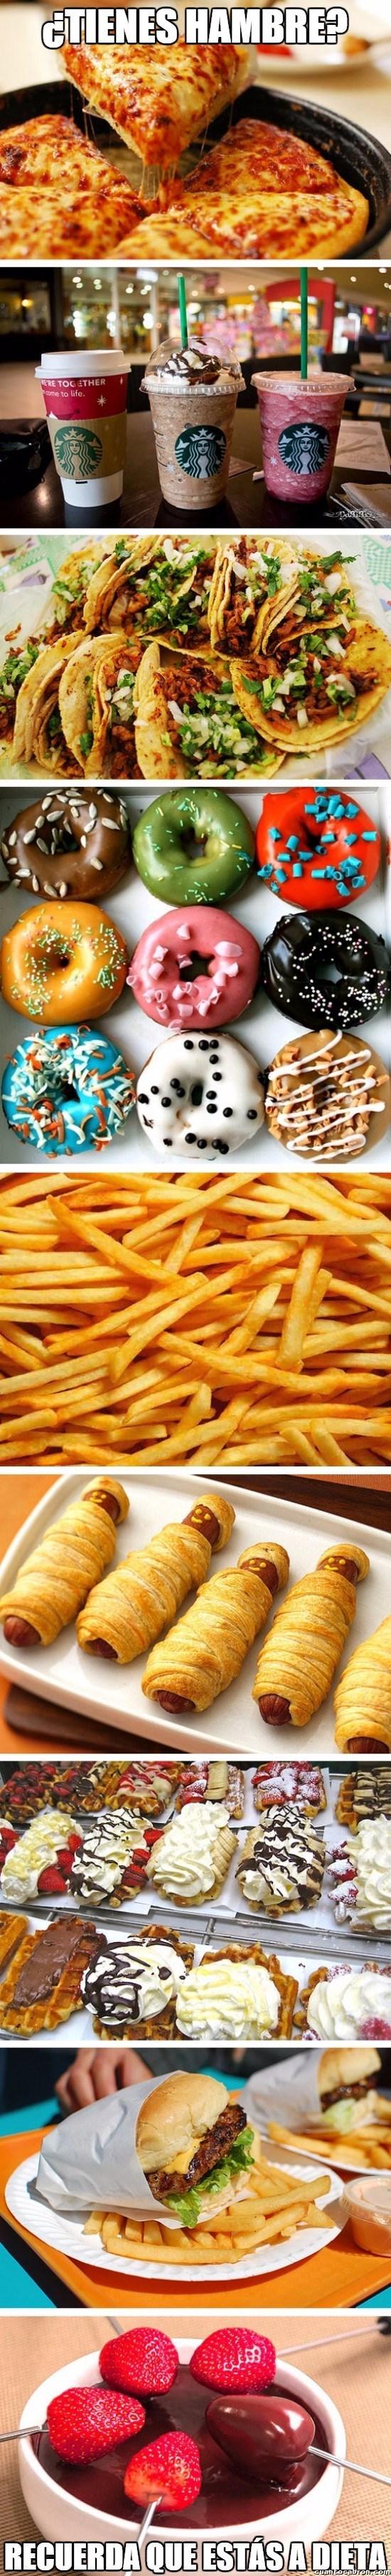 estas a dieta